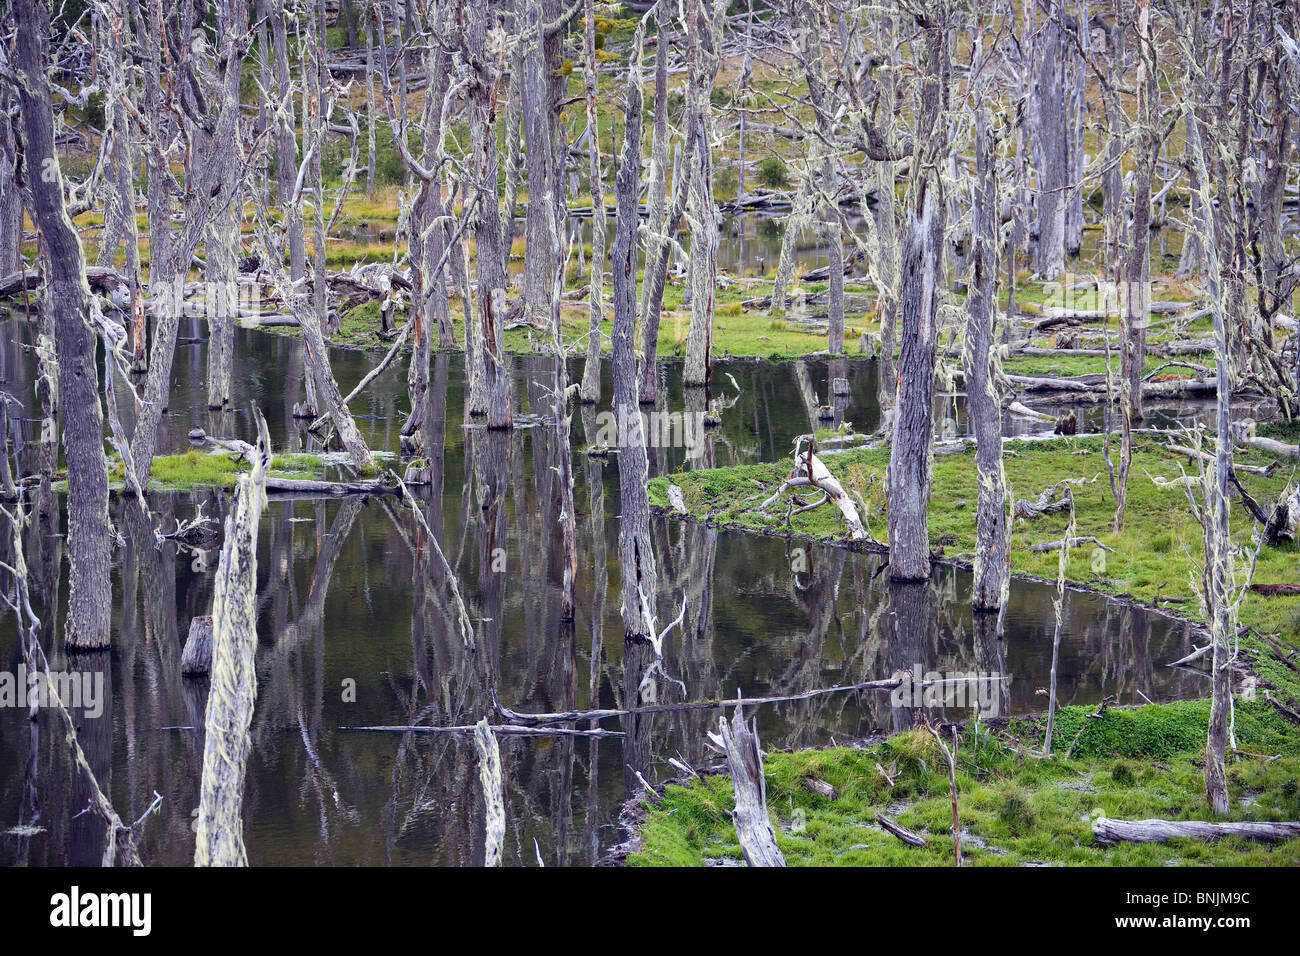 Argentina Südamerika Amerika March 2009 Tierra del Fuego Landscape scenery dead trees nature natural water - Stock Image